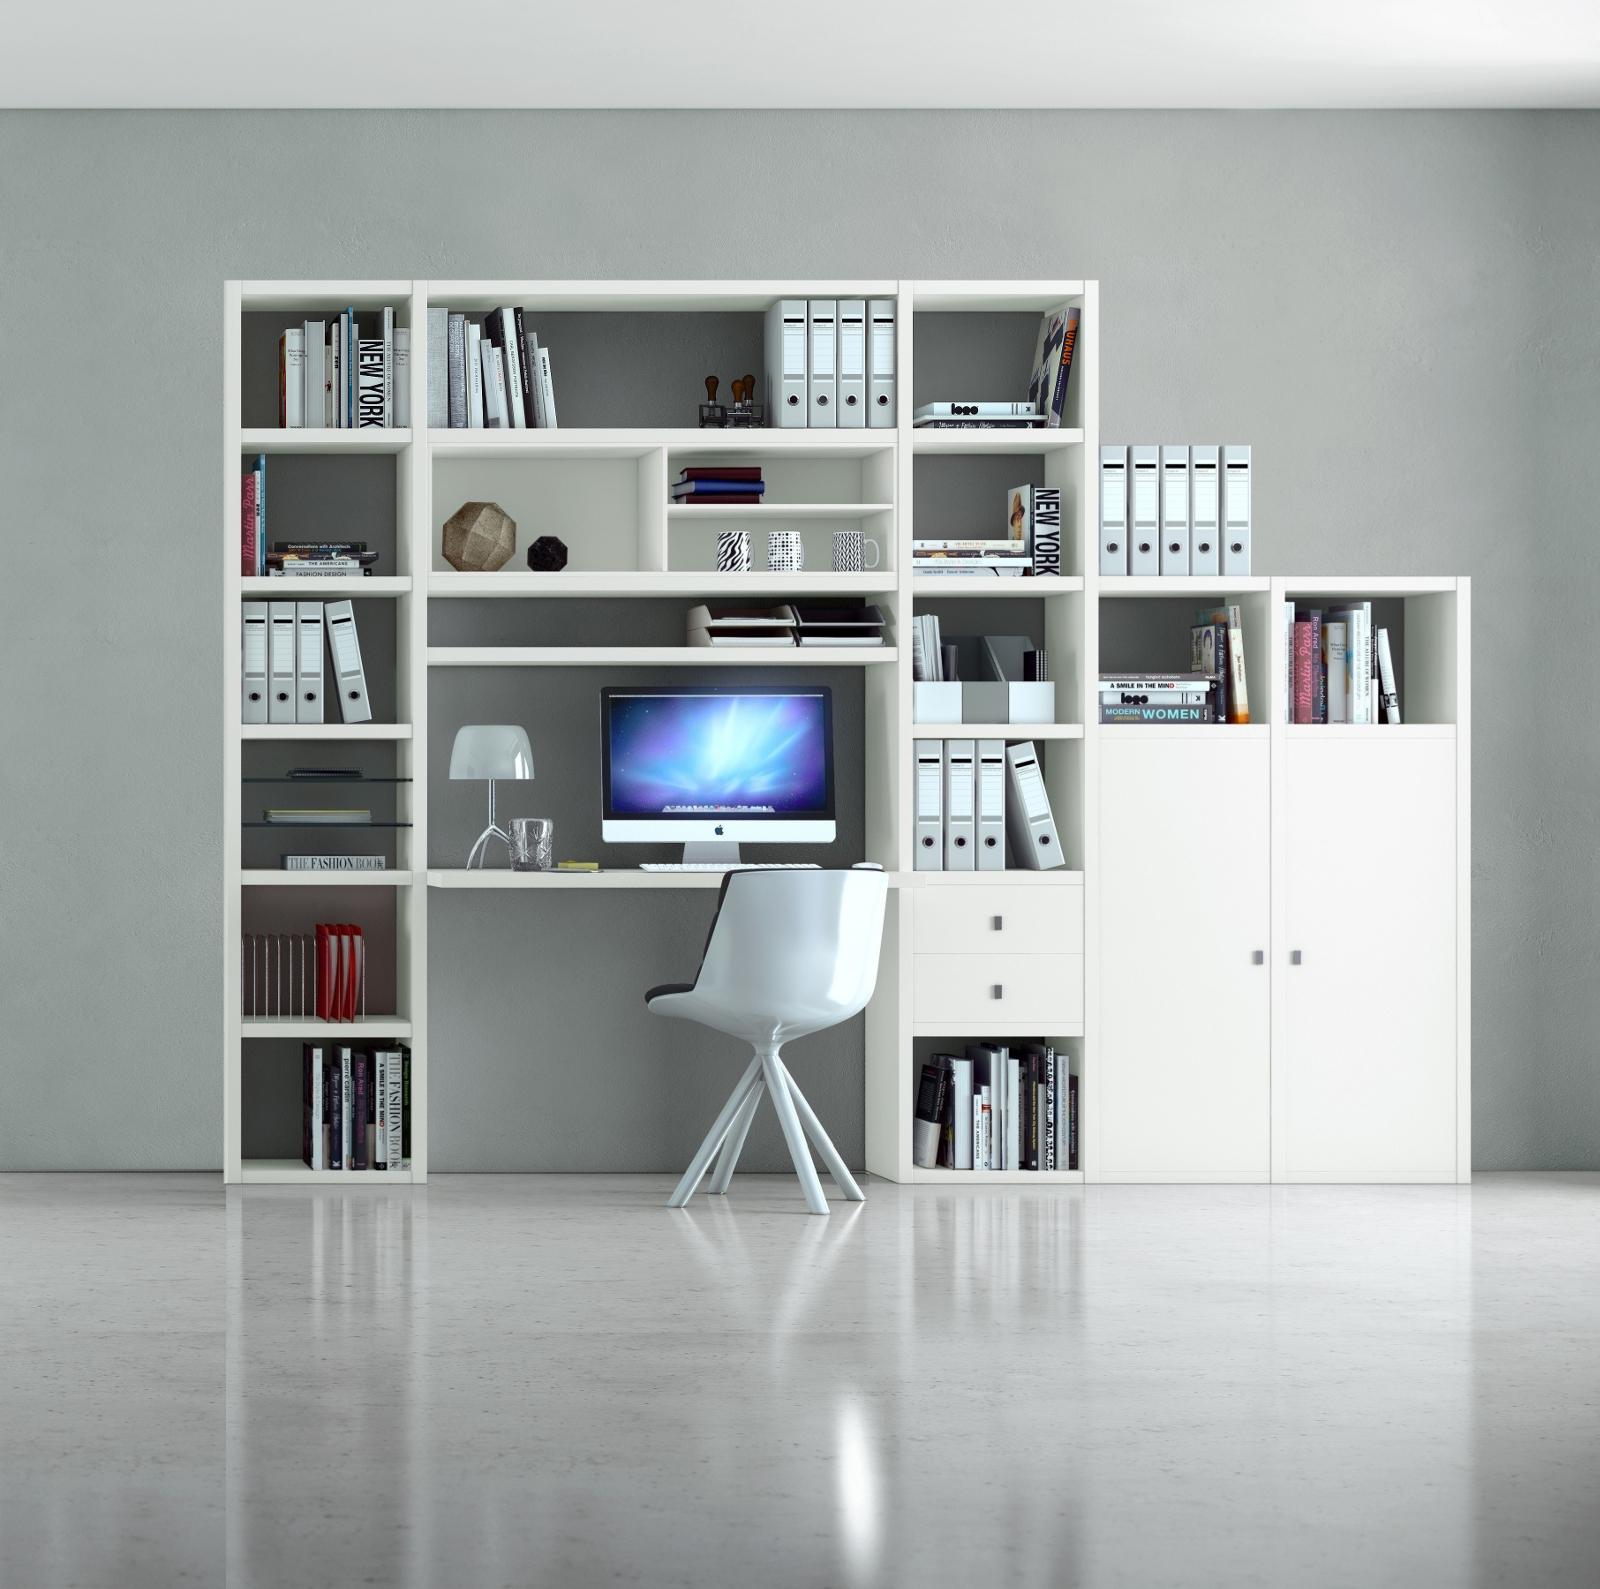 Büromöbel & homeoffice möbel günstig online kaufen ...